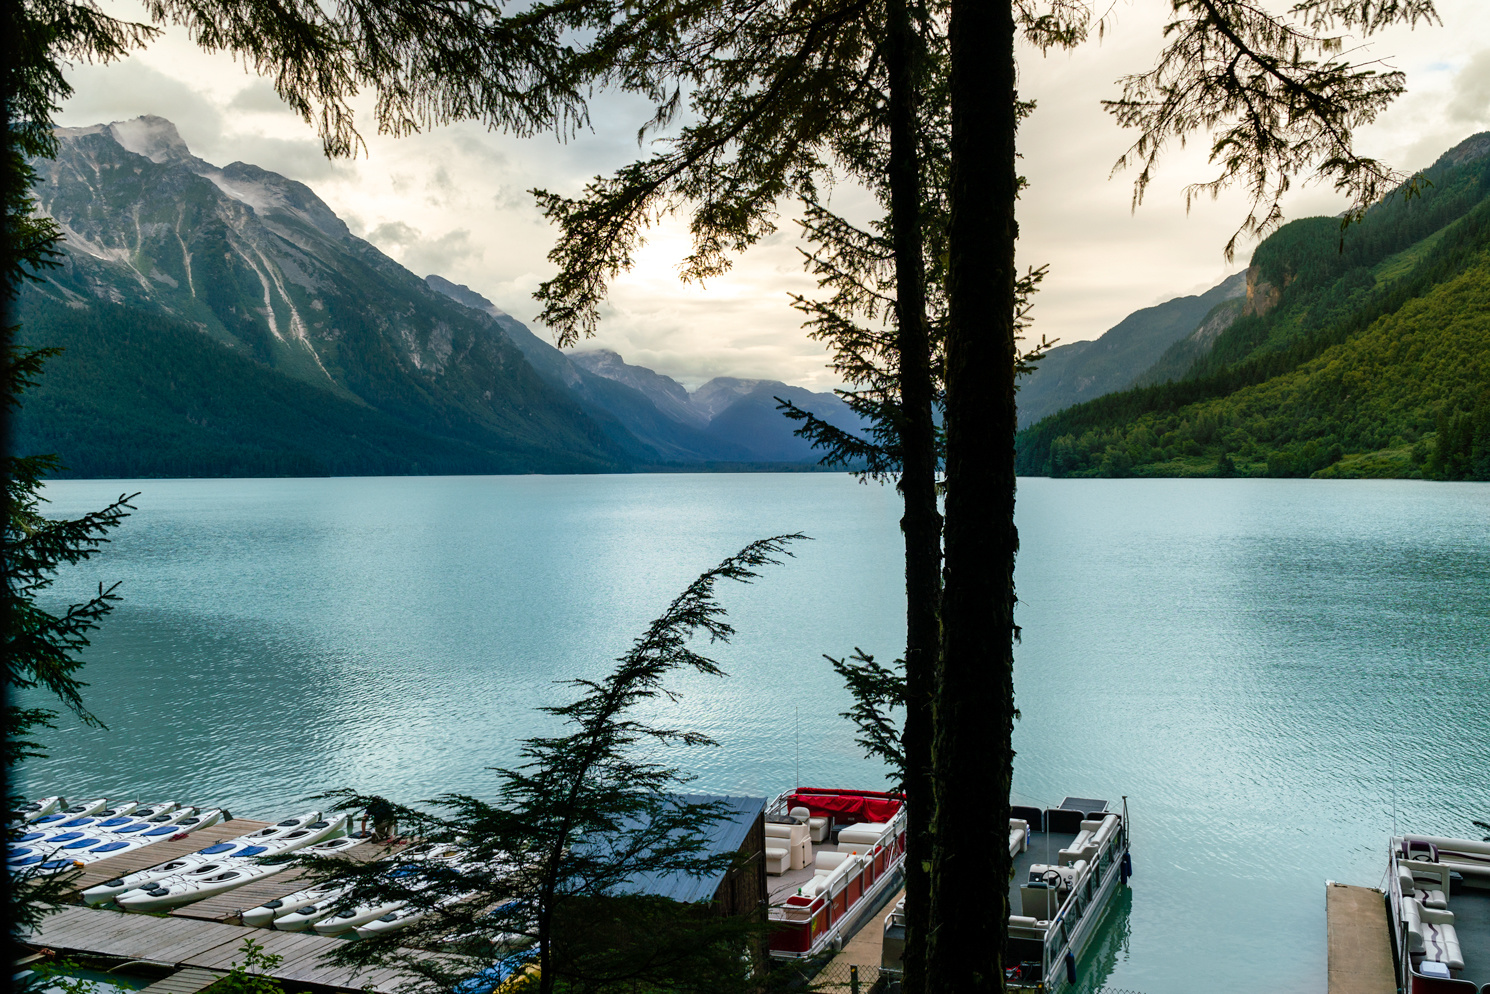 Chilkoot Lake by Nicholas Vettorel